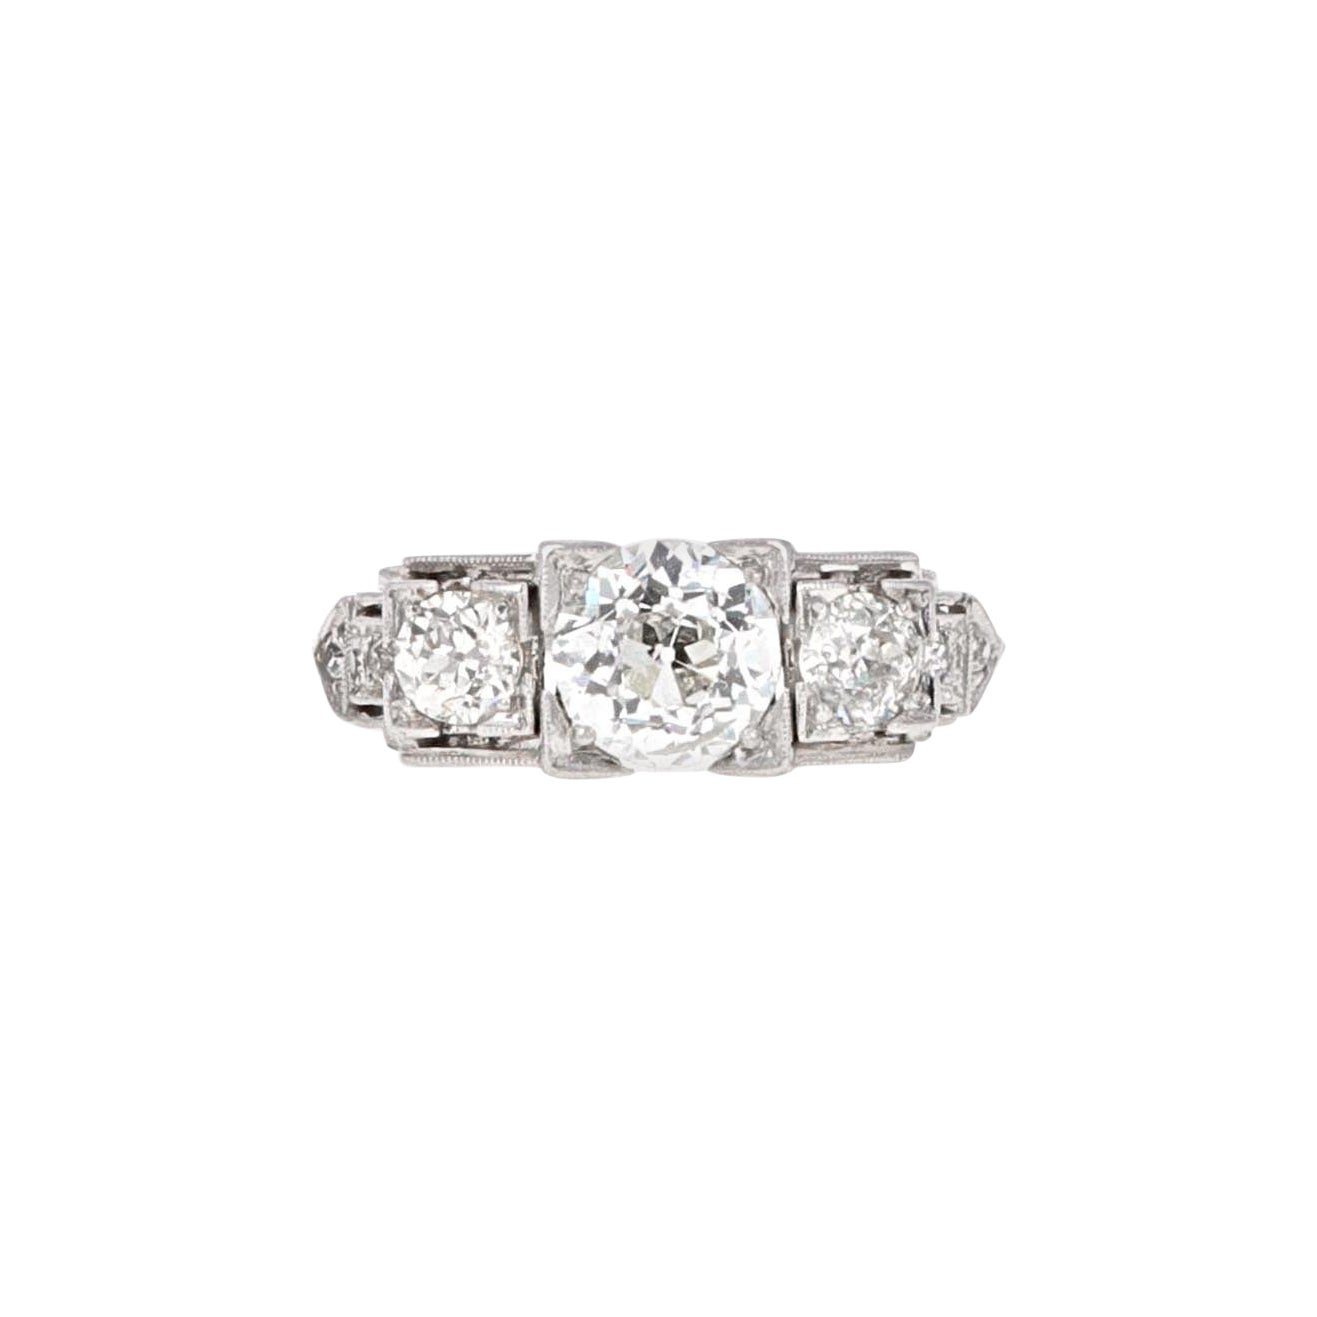 Platinum Art Deco Three-Stone Diamond Ring